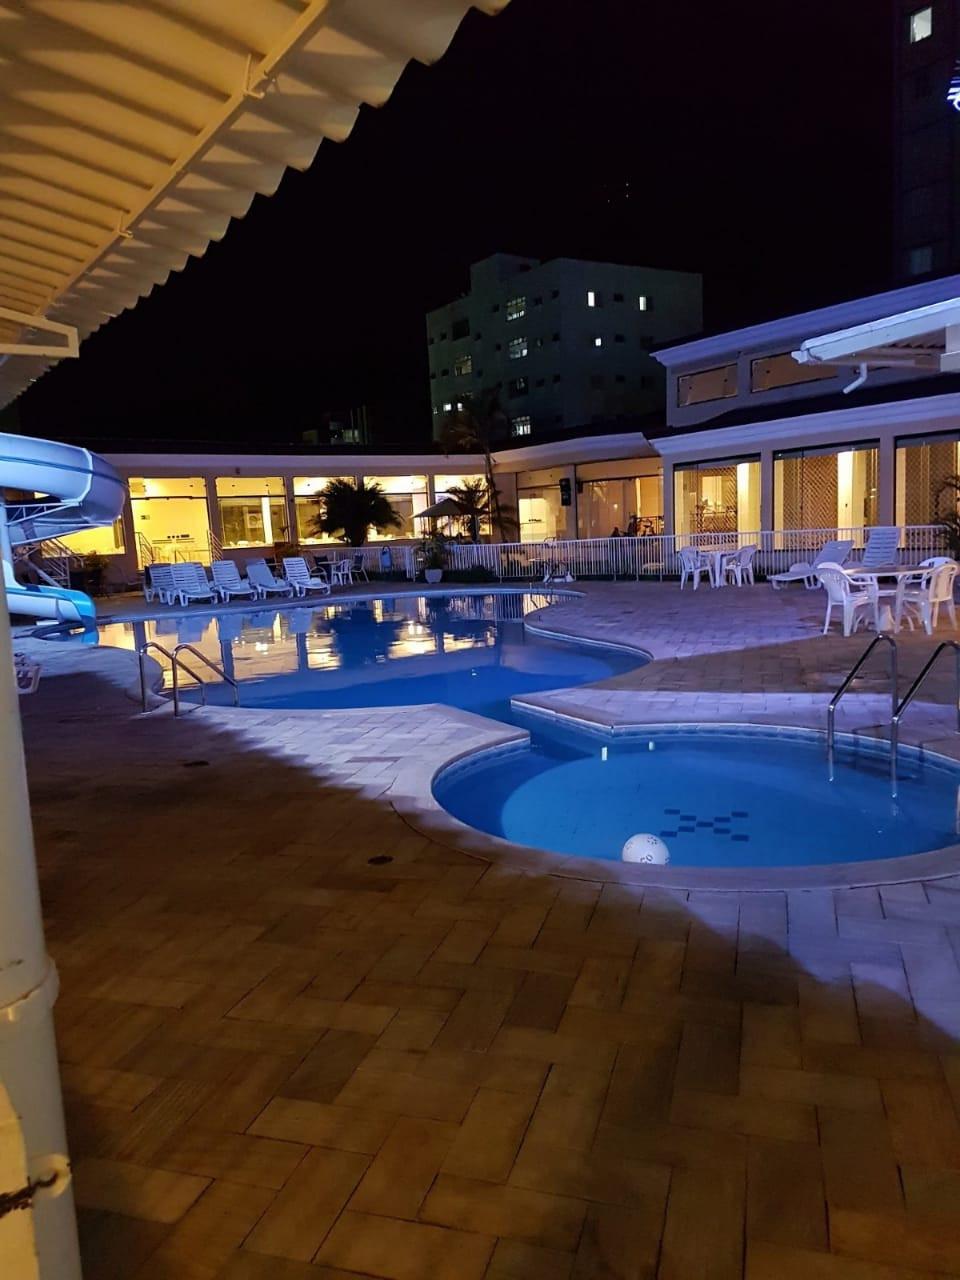 Vista do Hotel - Piscina, tobogã e piscina infantil